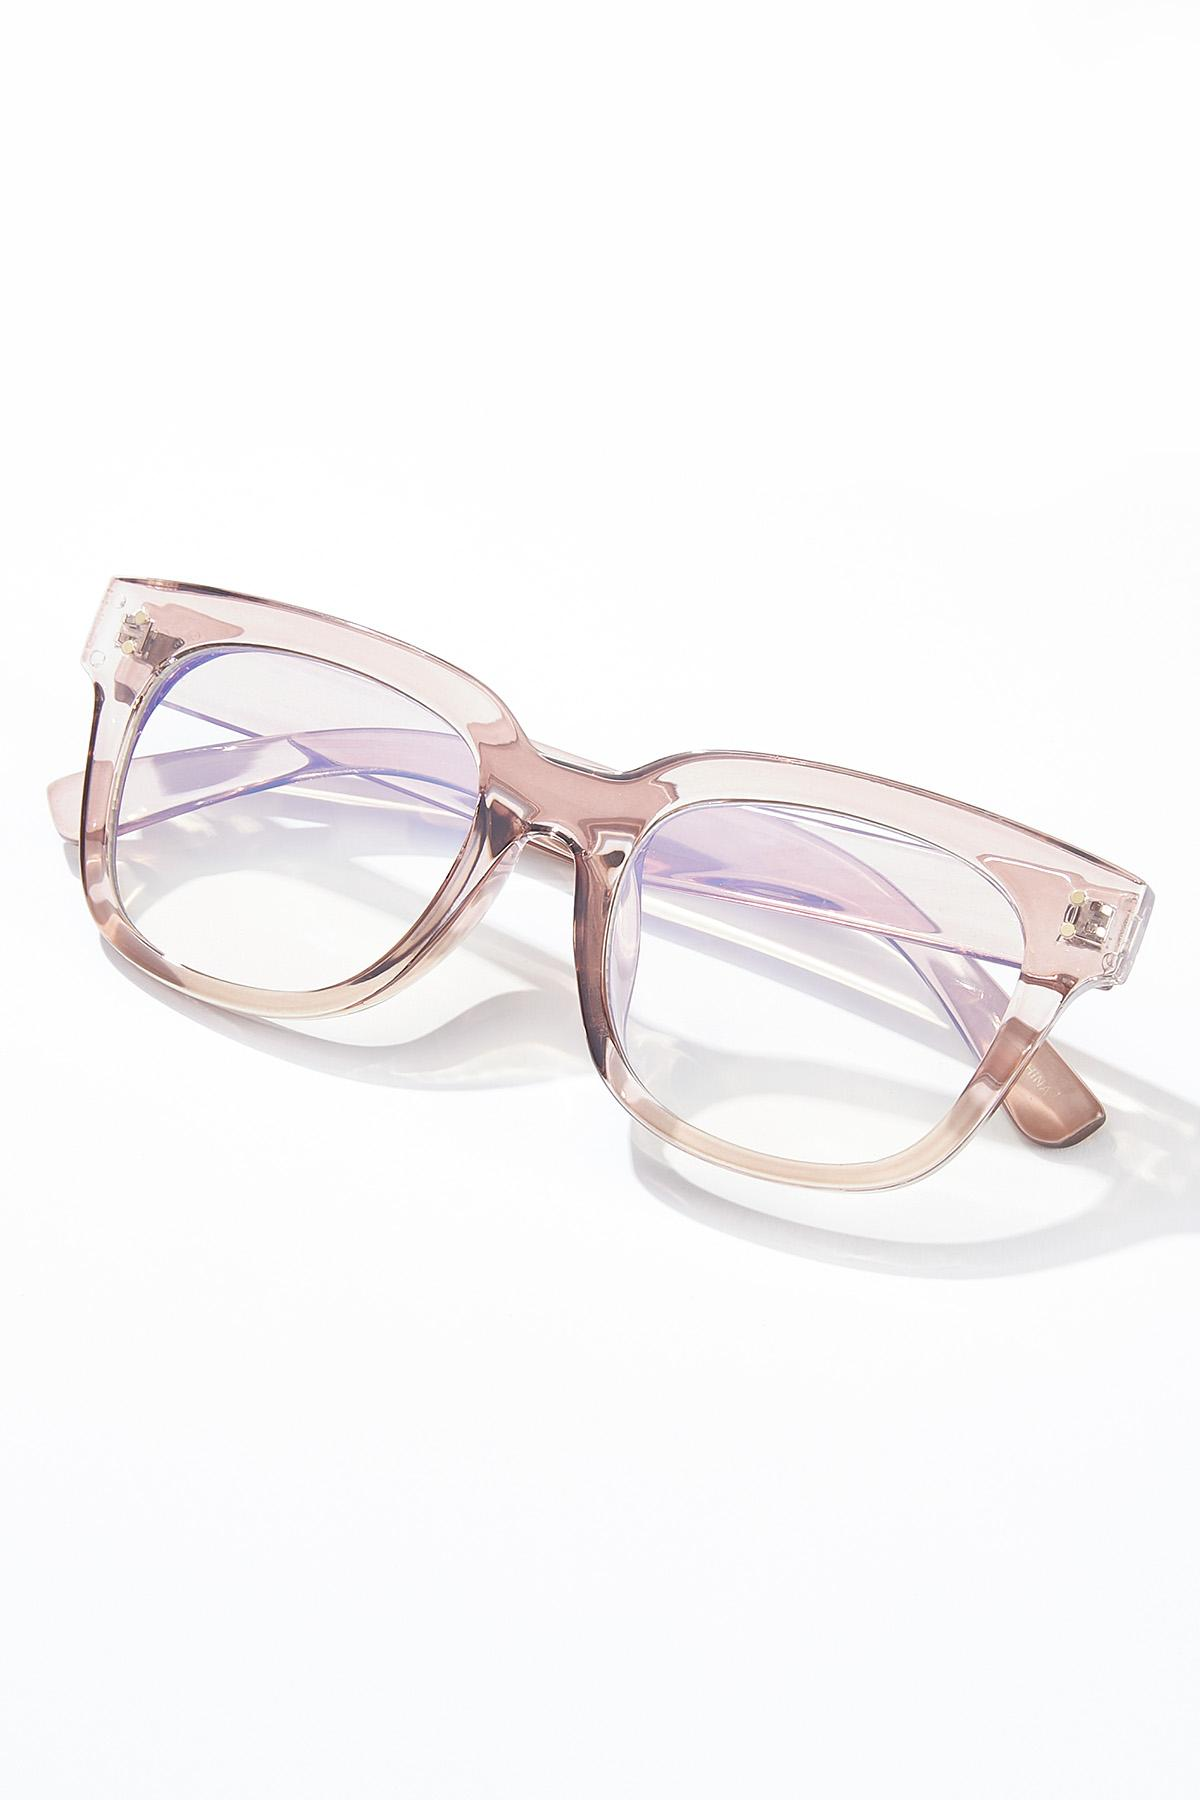 Lucite Tan Blue Light Glasses (Item #44629677)